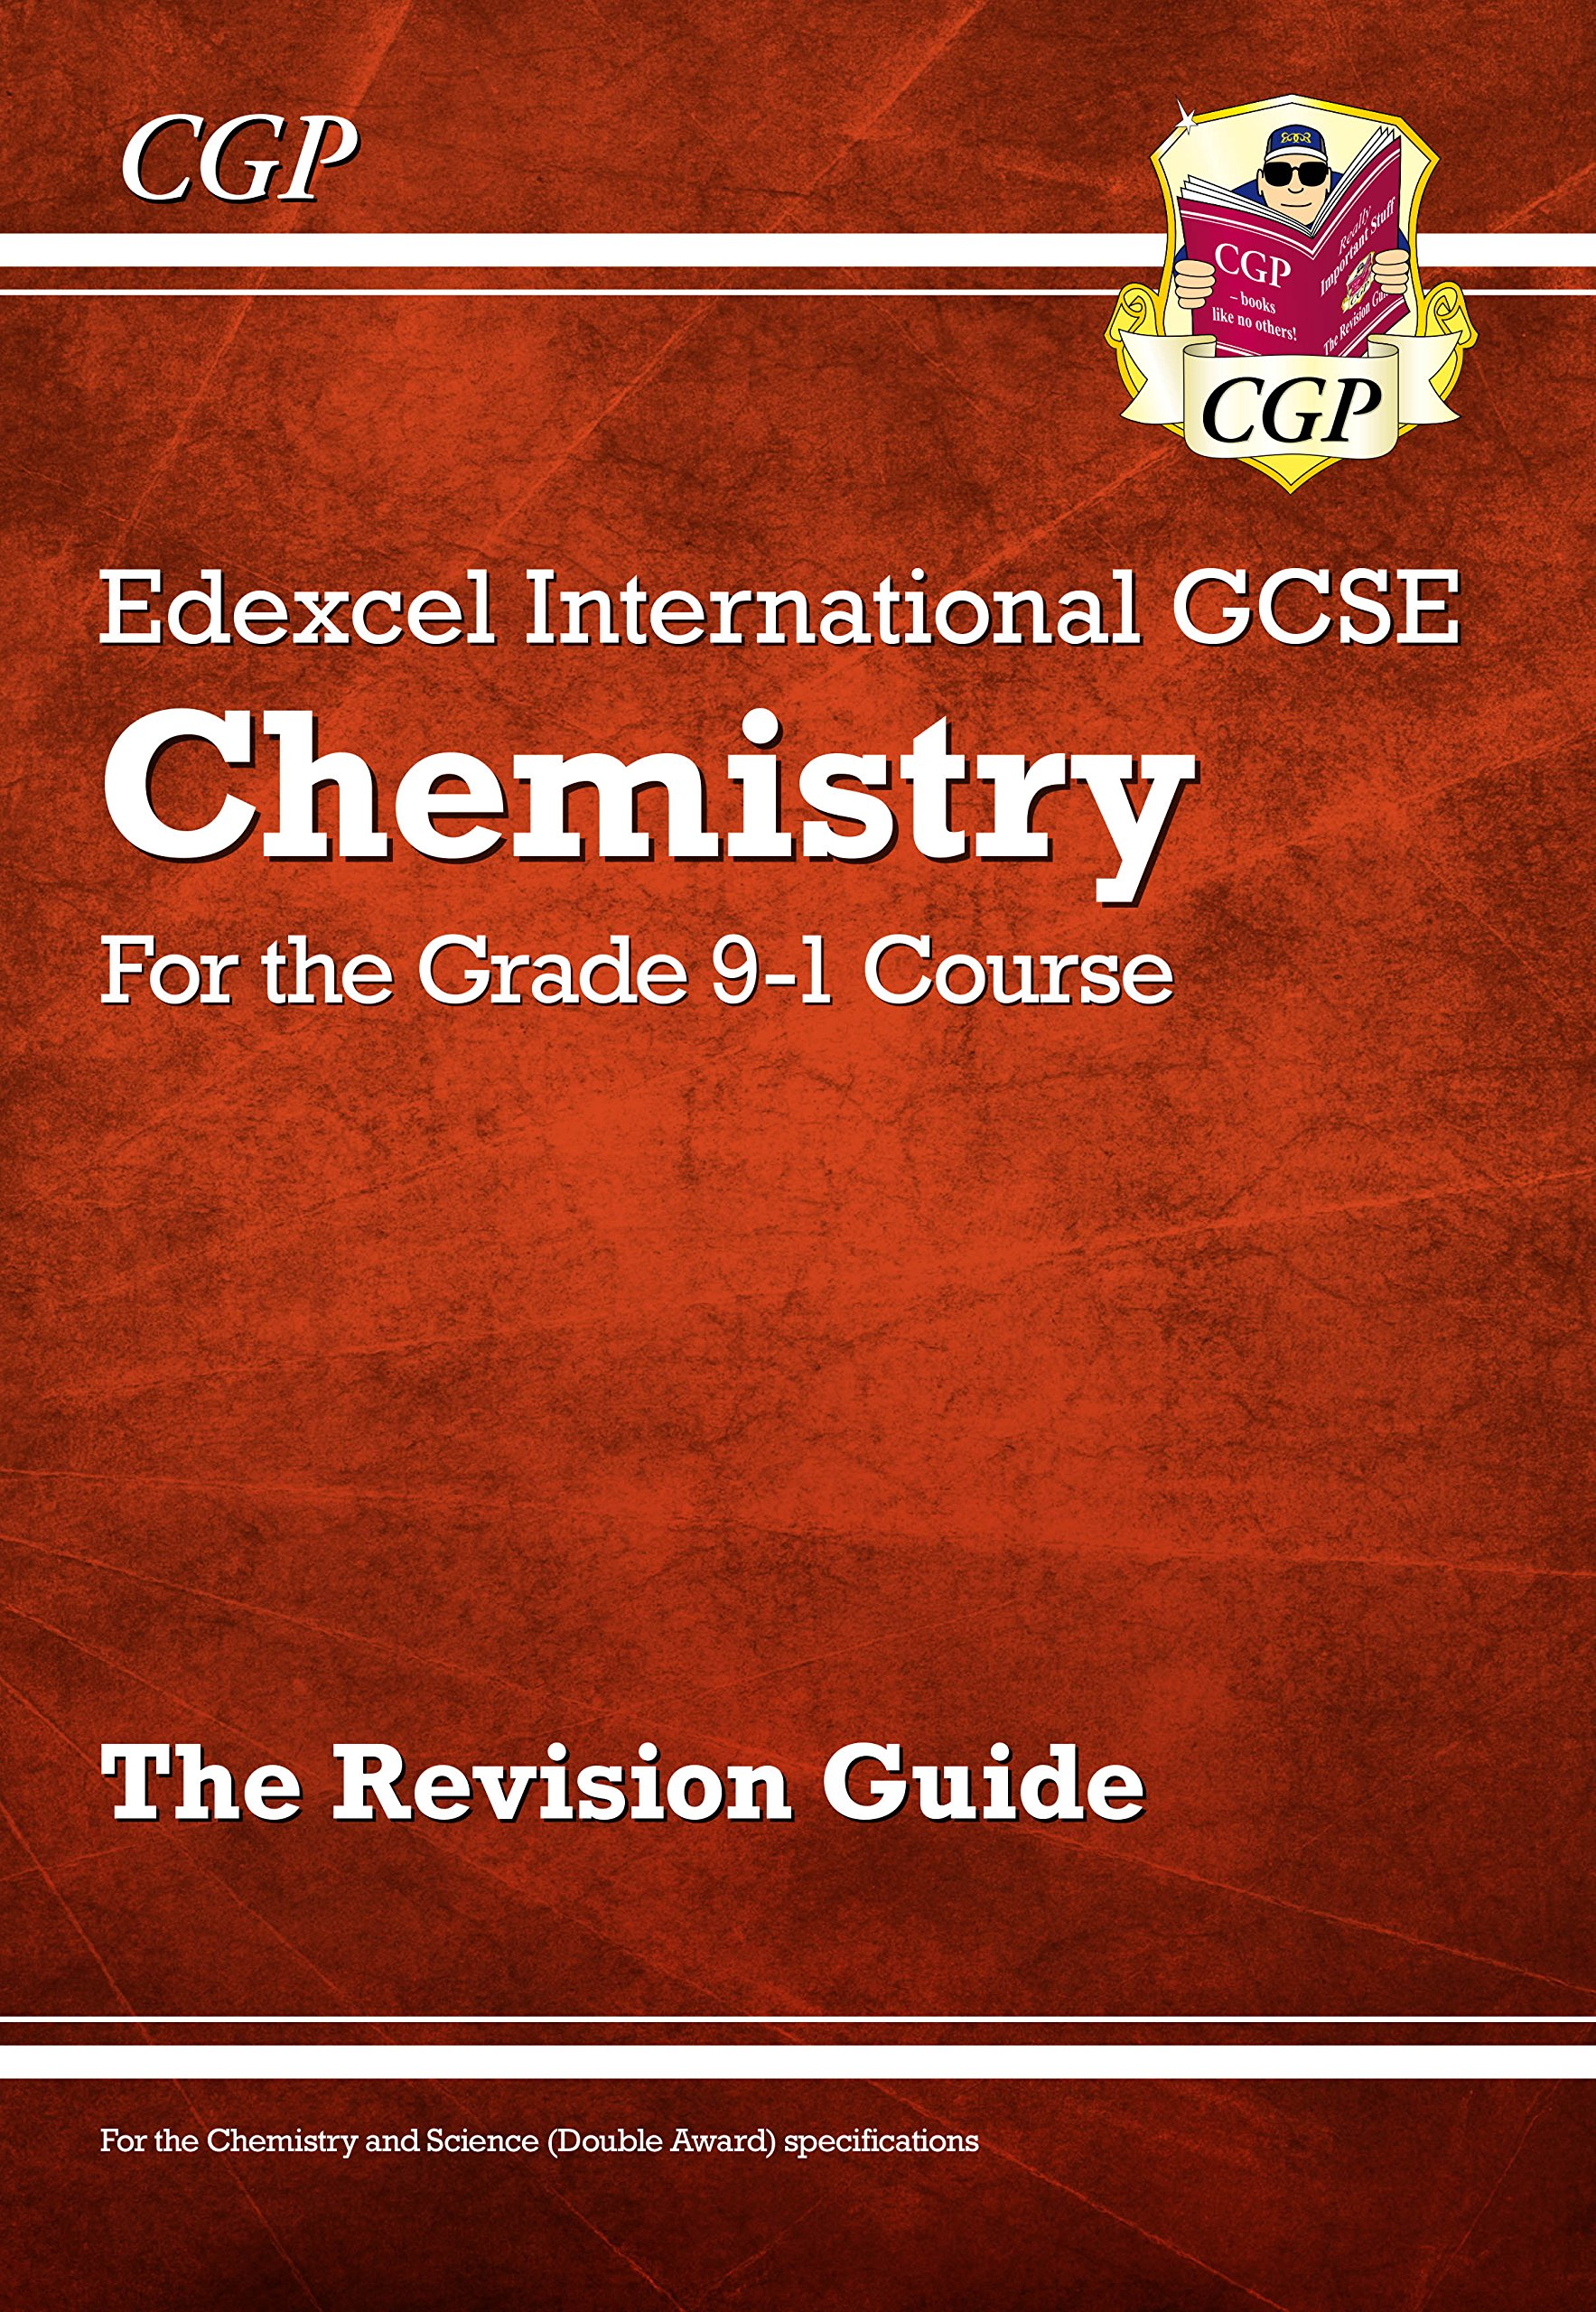 New Grade 9 1 Edexcel International GCSE Chemistry  Revision Guide  CGP IGCSE 9 1 Revision   English Edition